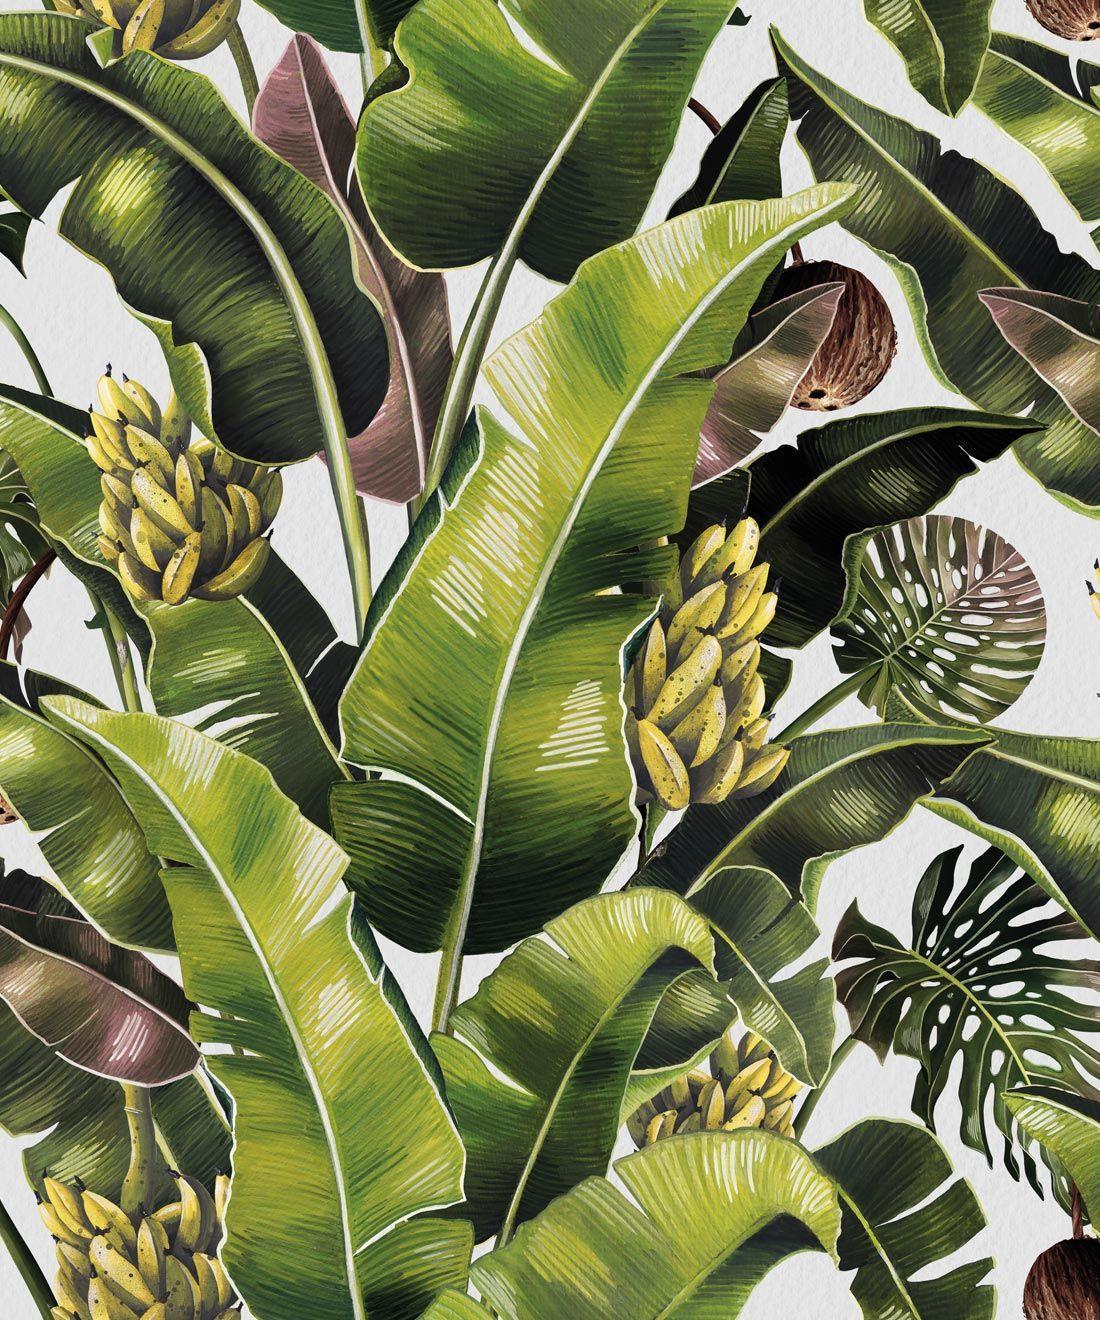 Banana Leaf Wallpapers - Top Free Banana Leaf Backgrounds ...